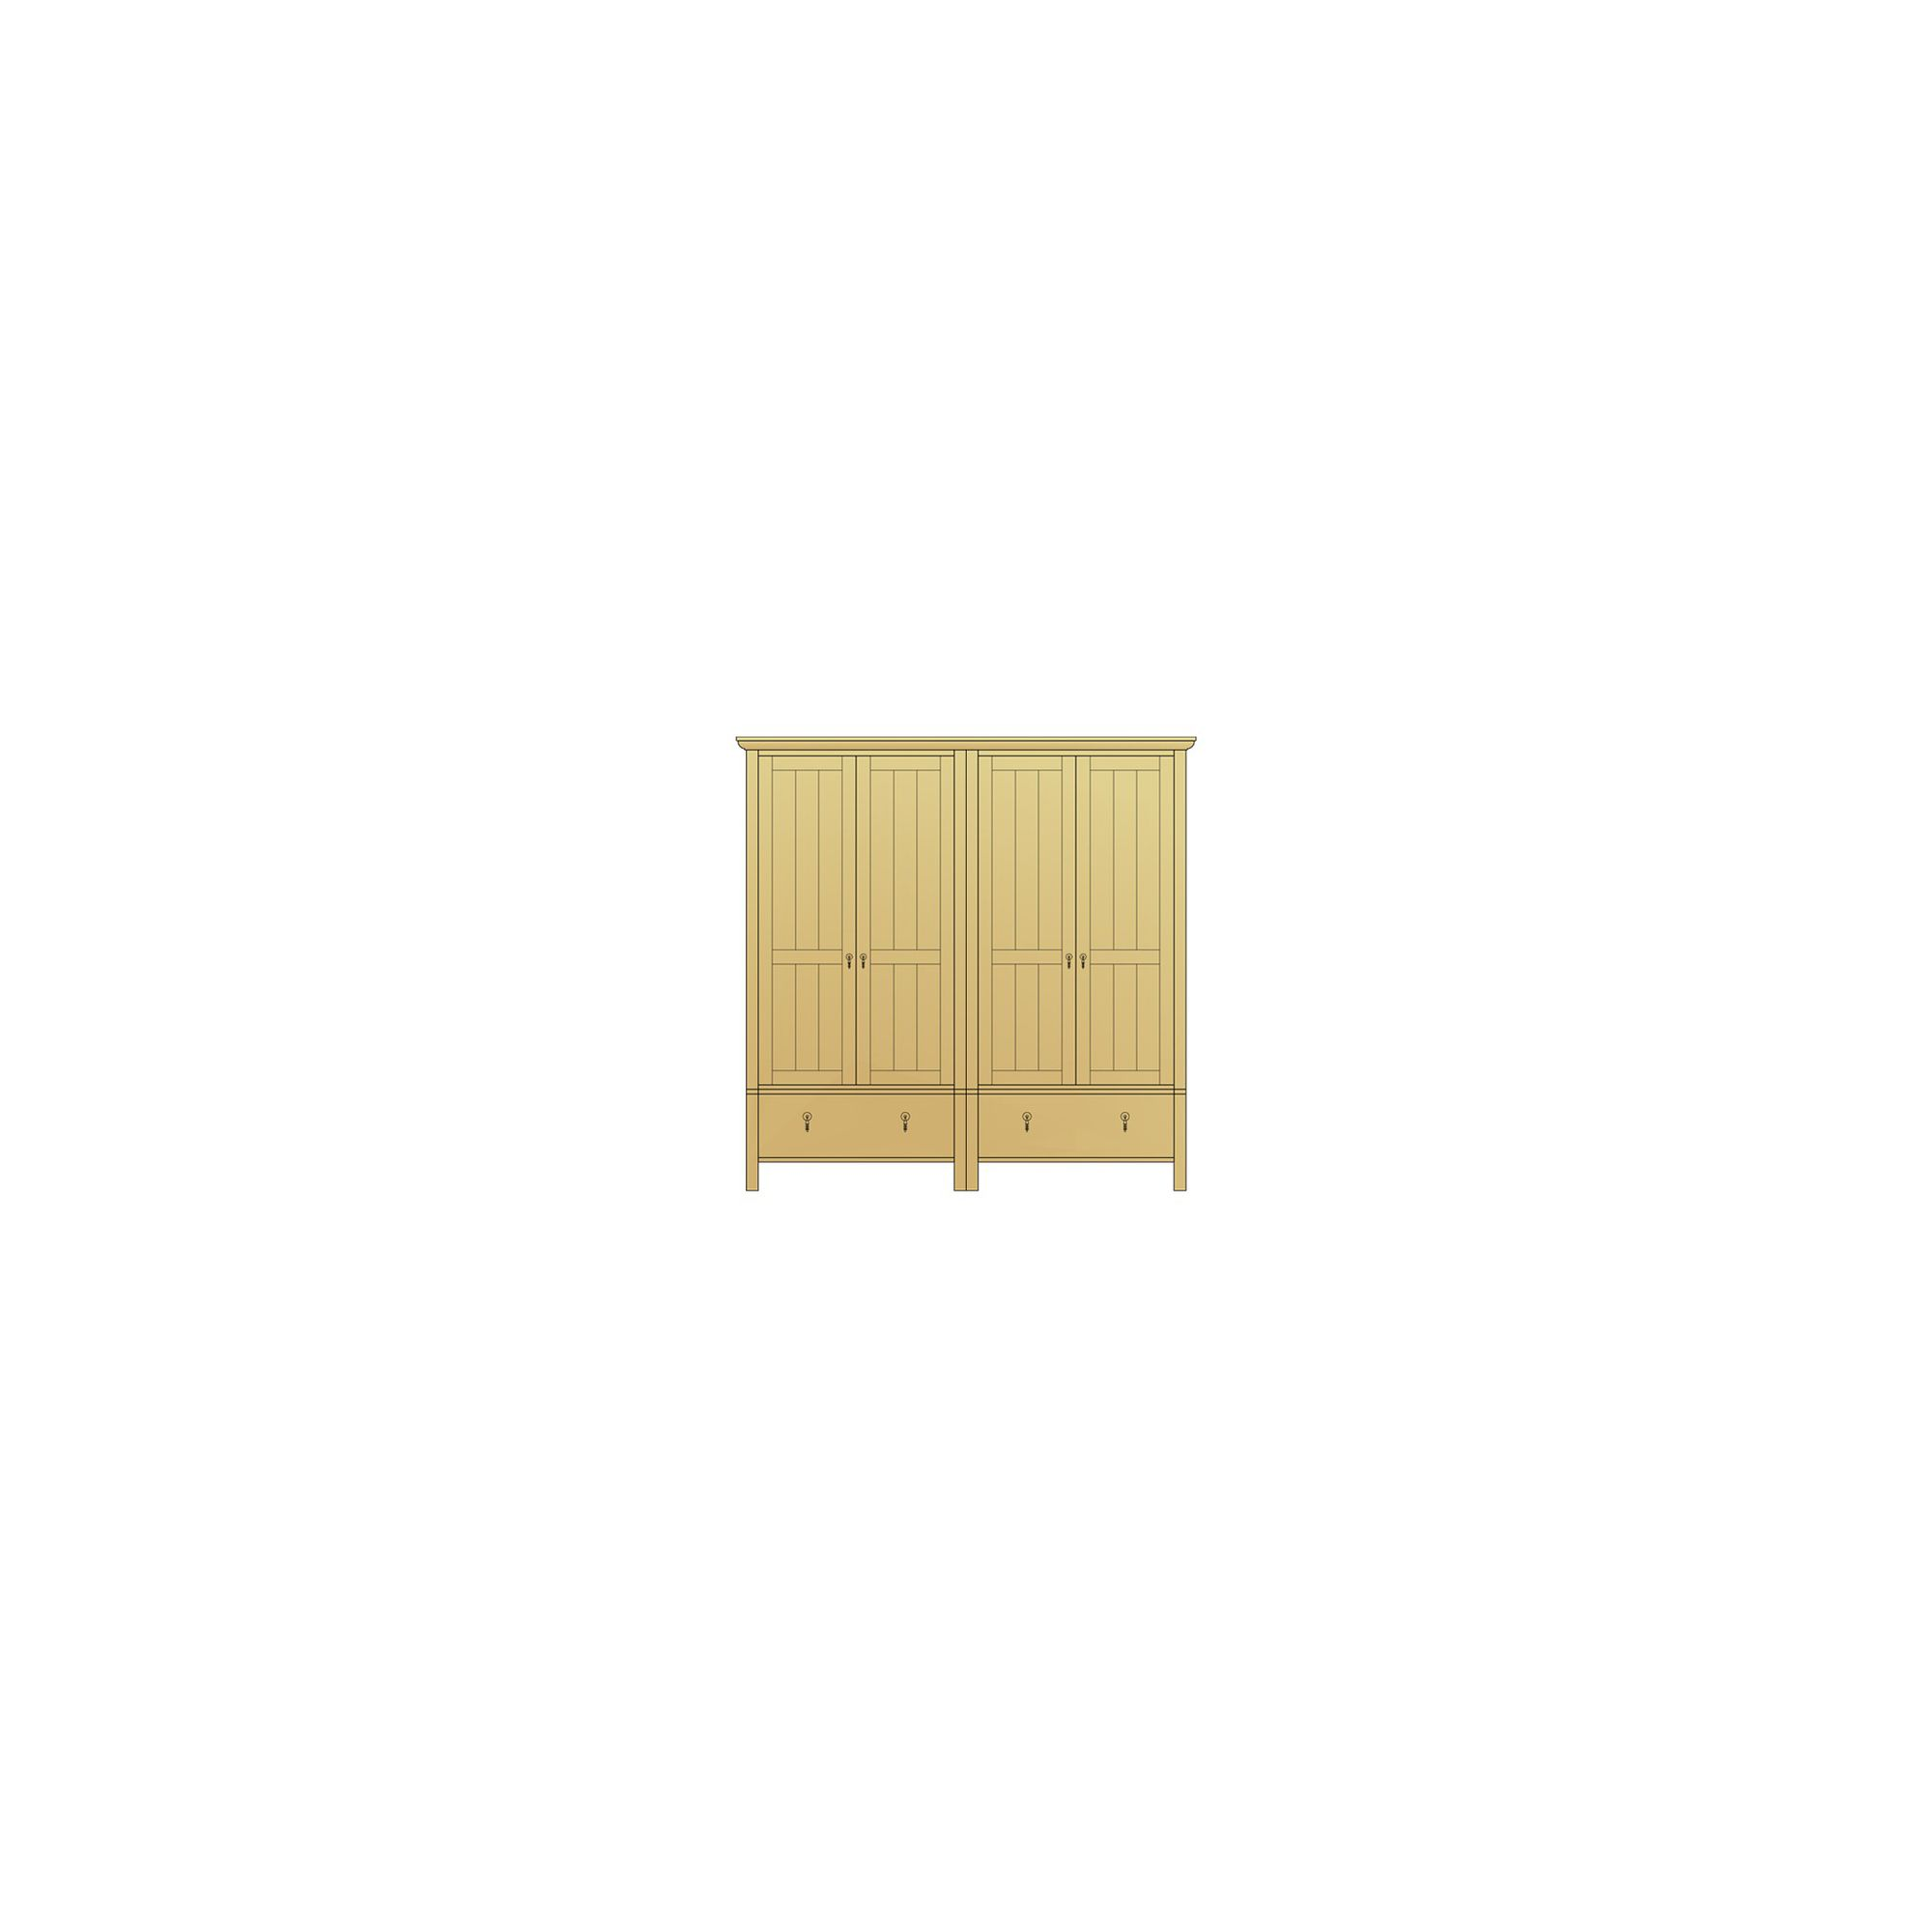 Sherry Designs Simply Bedroom 4 Door 2 Drawer Combination Oak Wardrobe at Tesco Direct